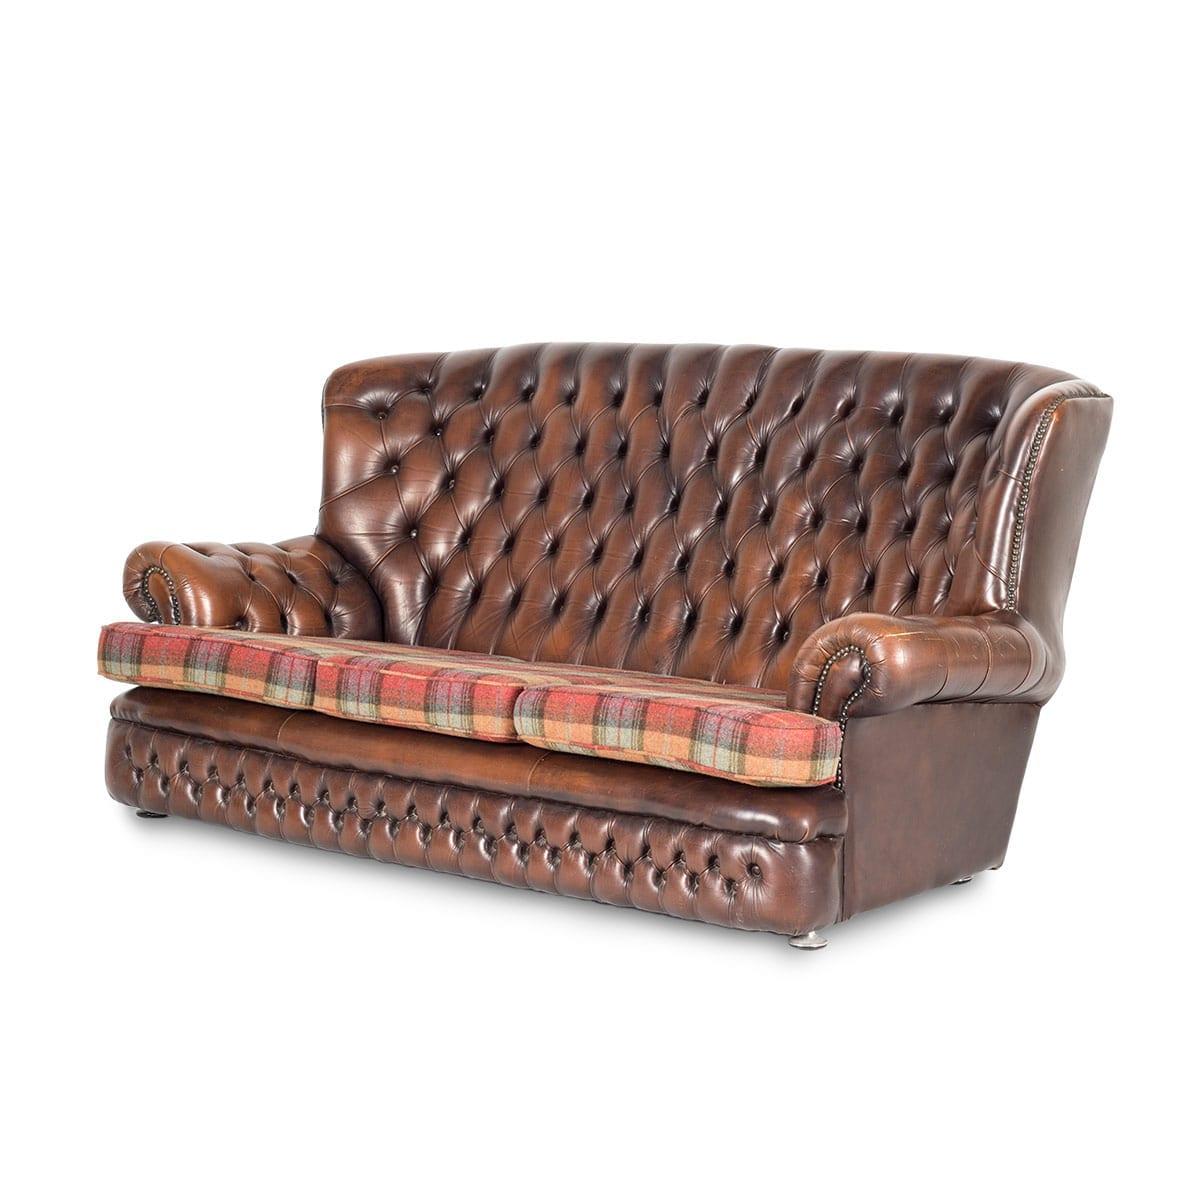 Customized Sofa Chesterfield A Really Original Design